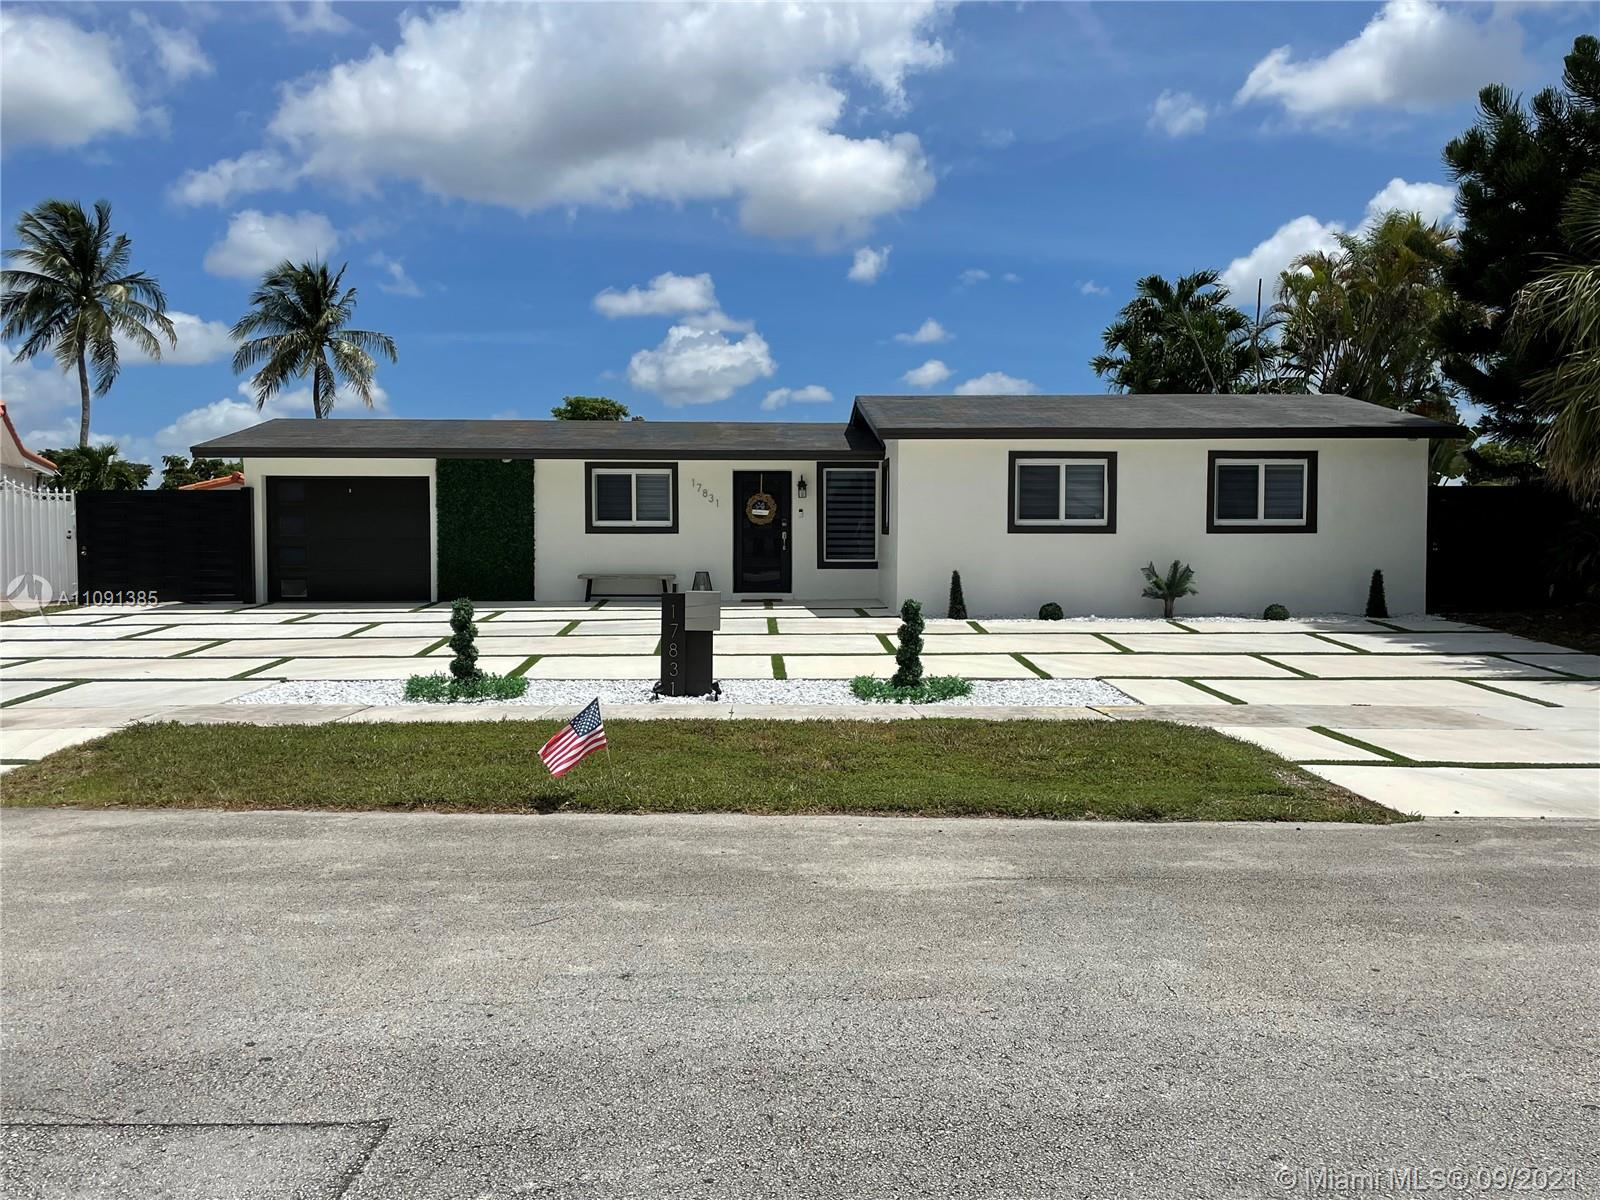 Palm Springs North - 17831 NW 84th Ct, Miami, FL 33015